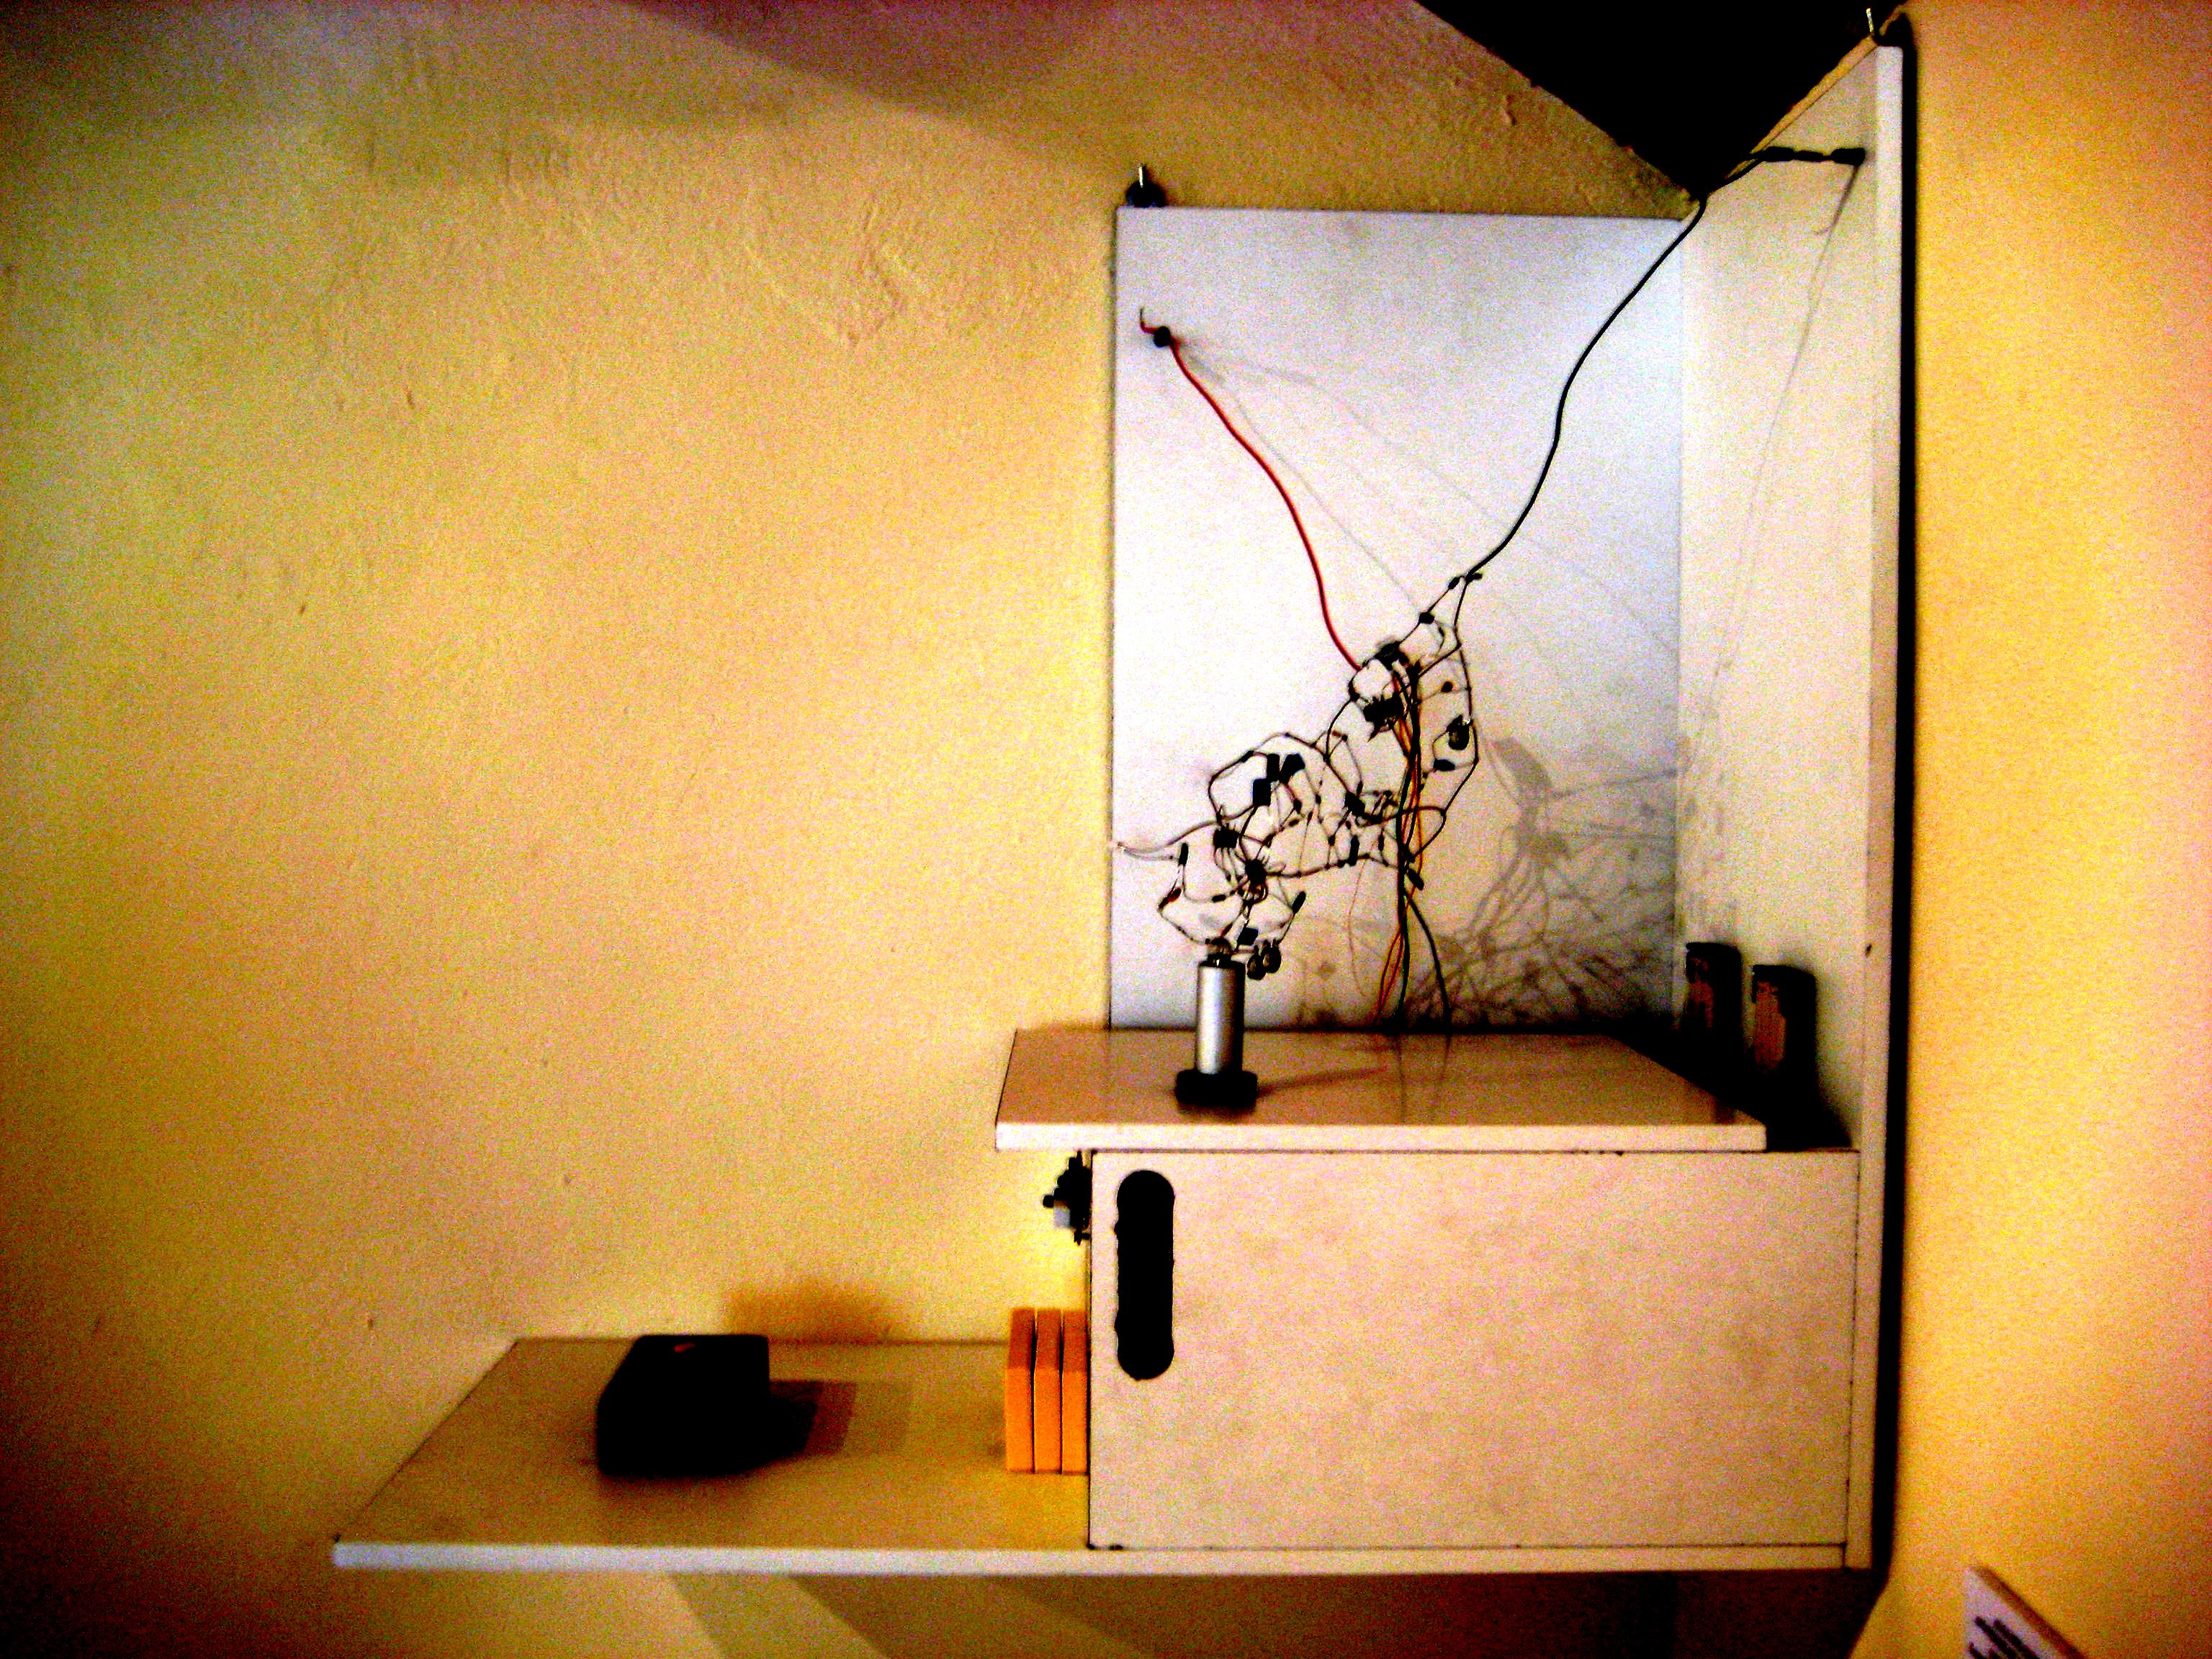 http://www.arteinformado.com/Eventos/68286/proyecto-trait-dunion-ii/ tarjeta TraitDunion_CATALOGO